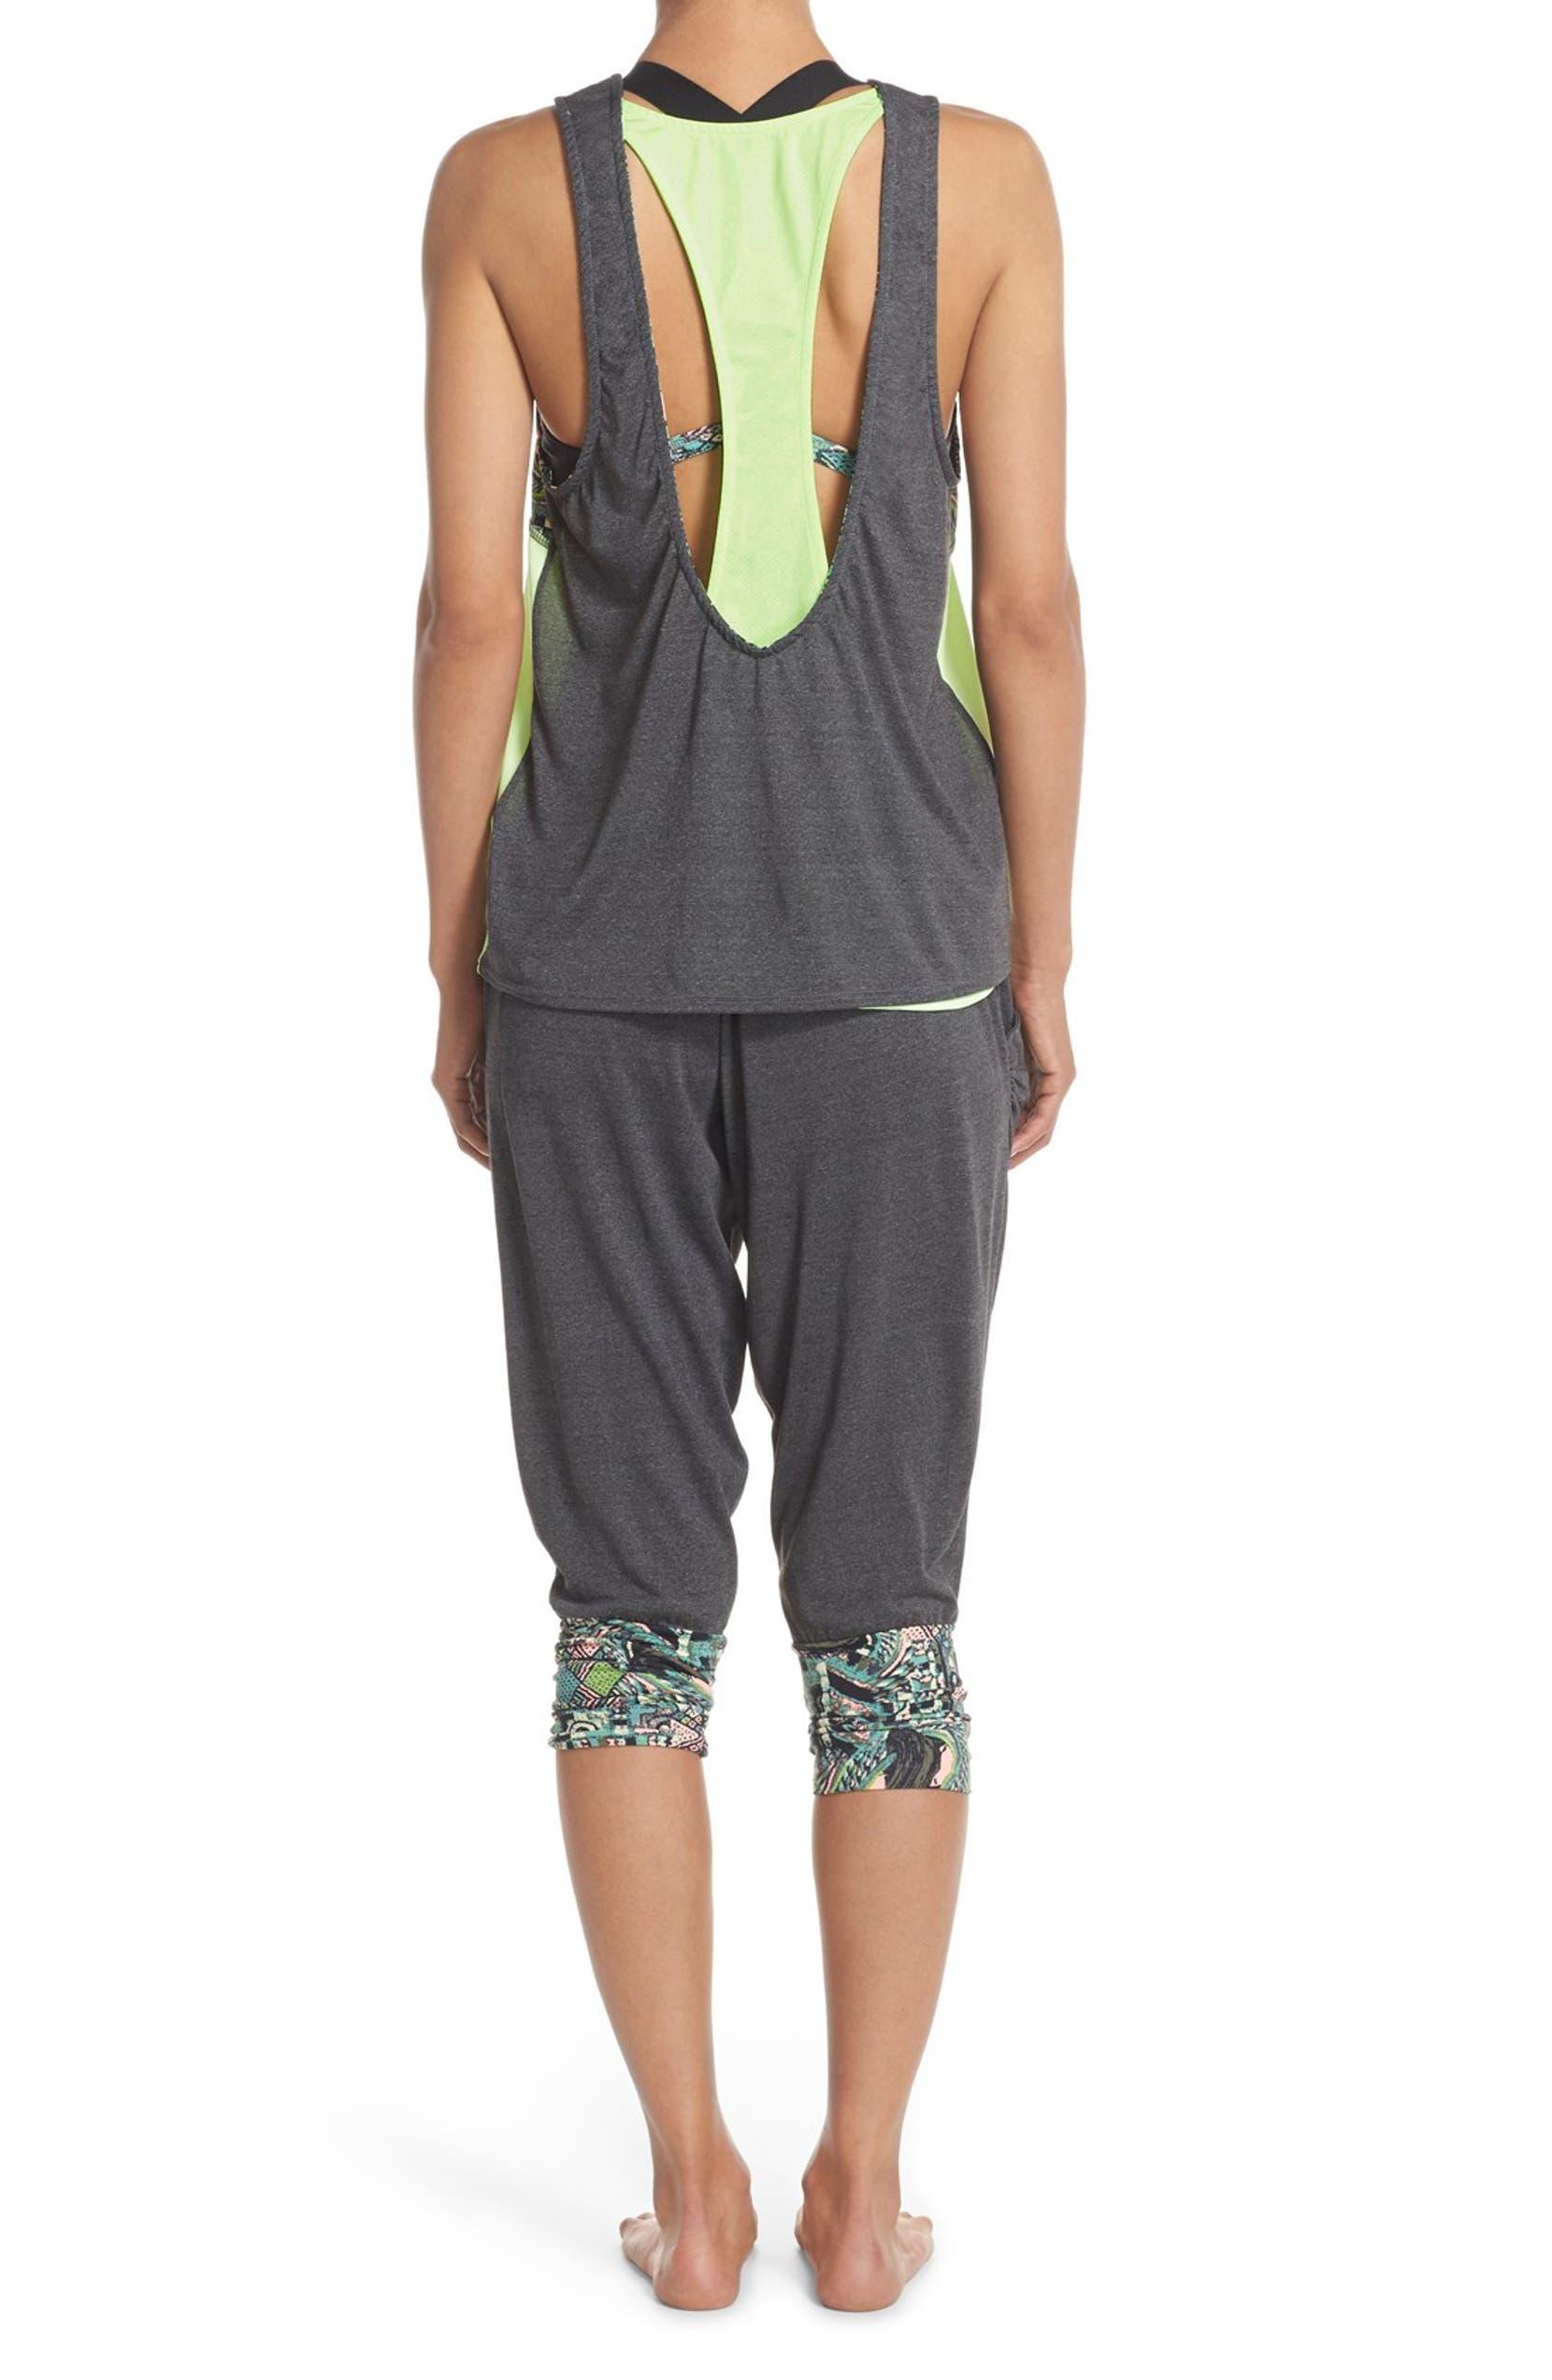 203742b3f902c Maaji 'Sea Breezy' Crop Yoga Pants | Nordstrom